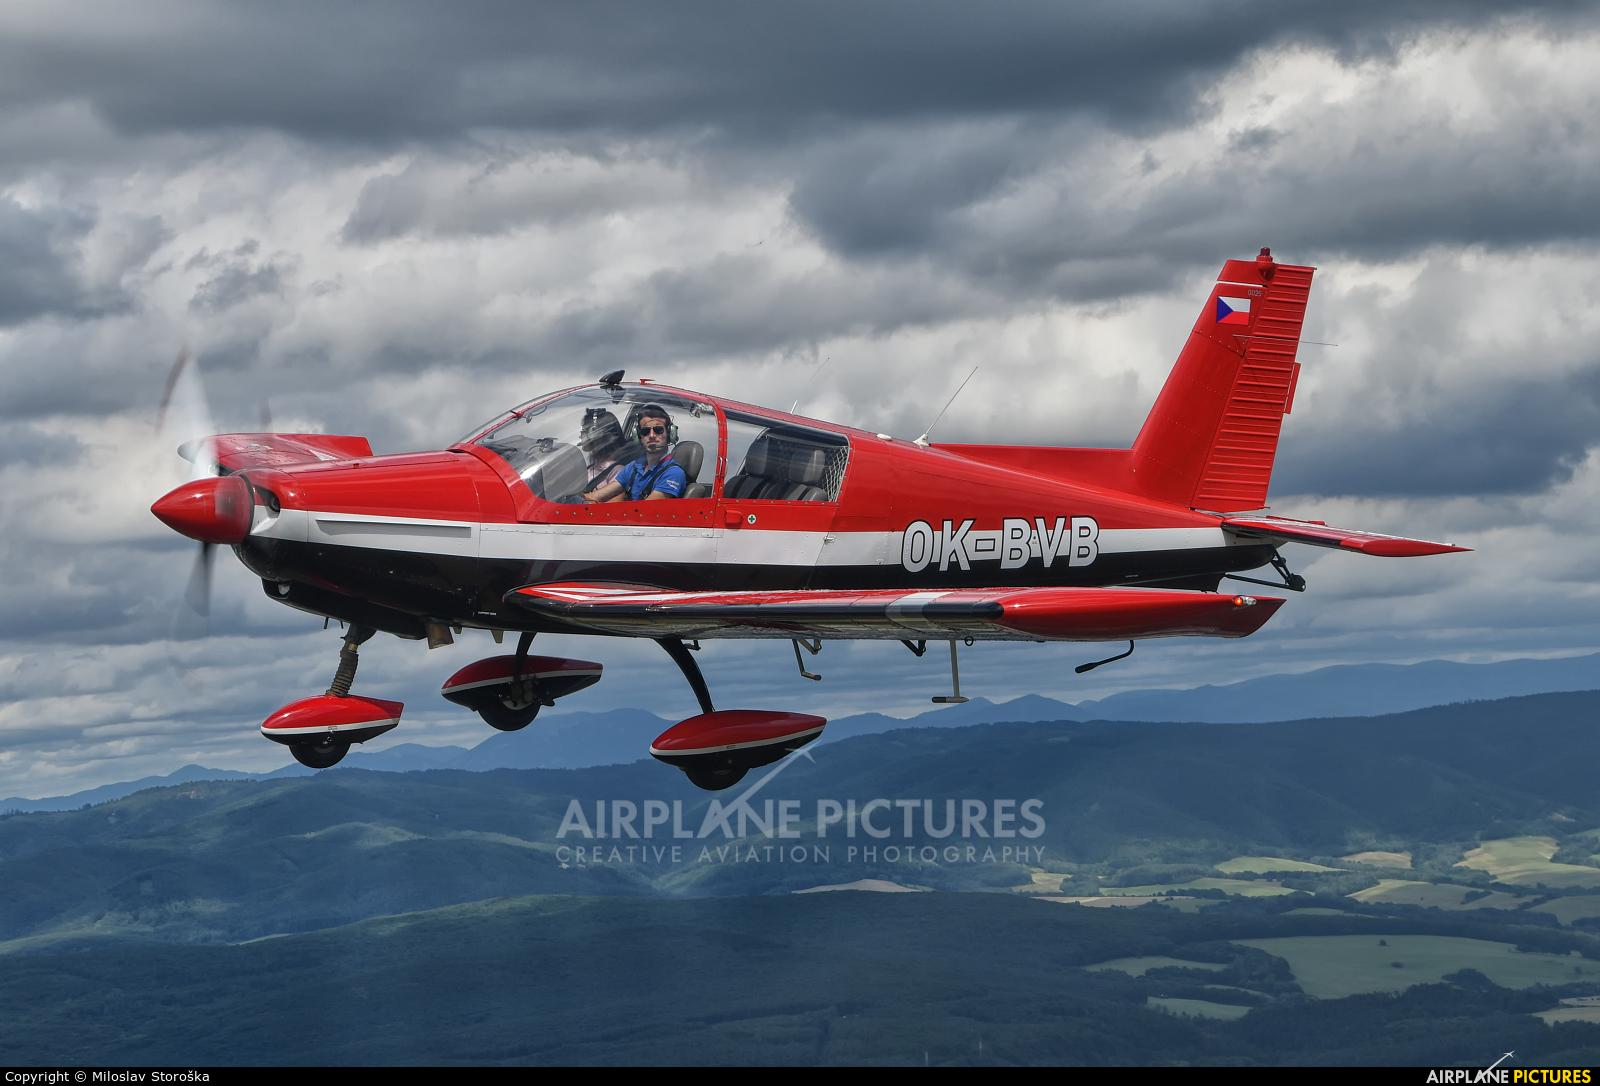 Aeroklub Bŕeclav OK-BVB aircraft at In Flight - Slovakia